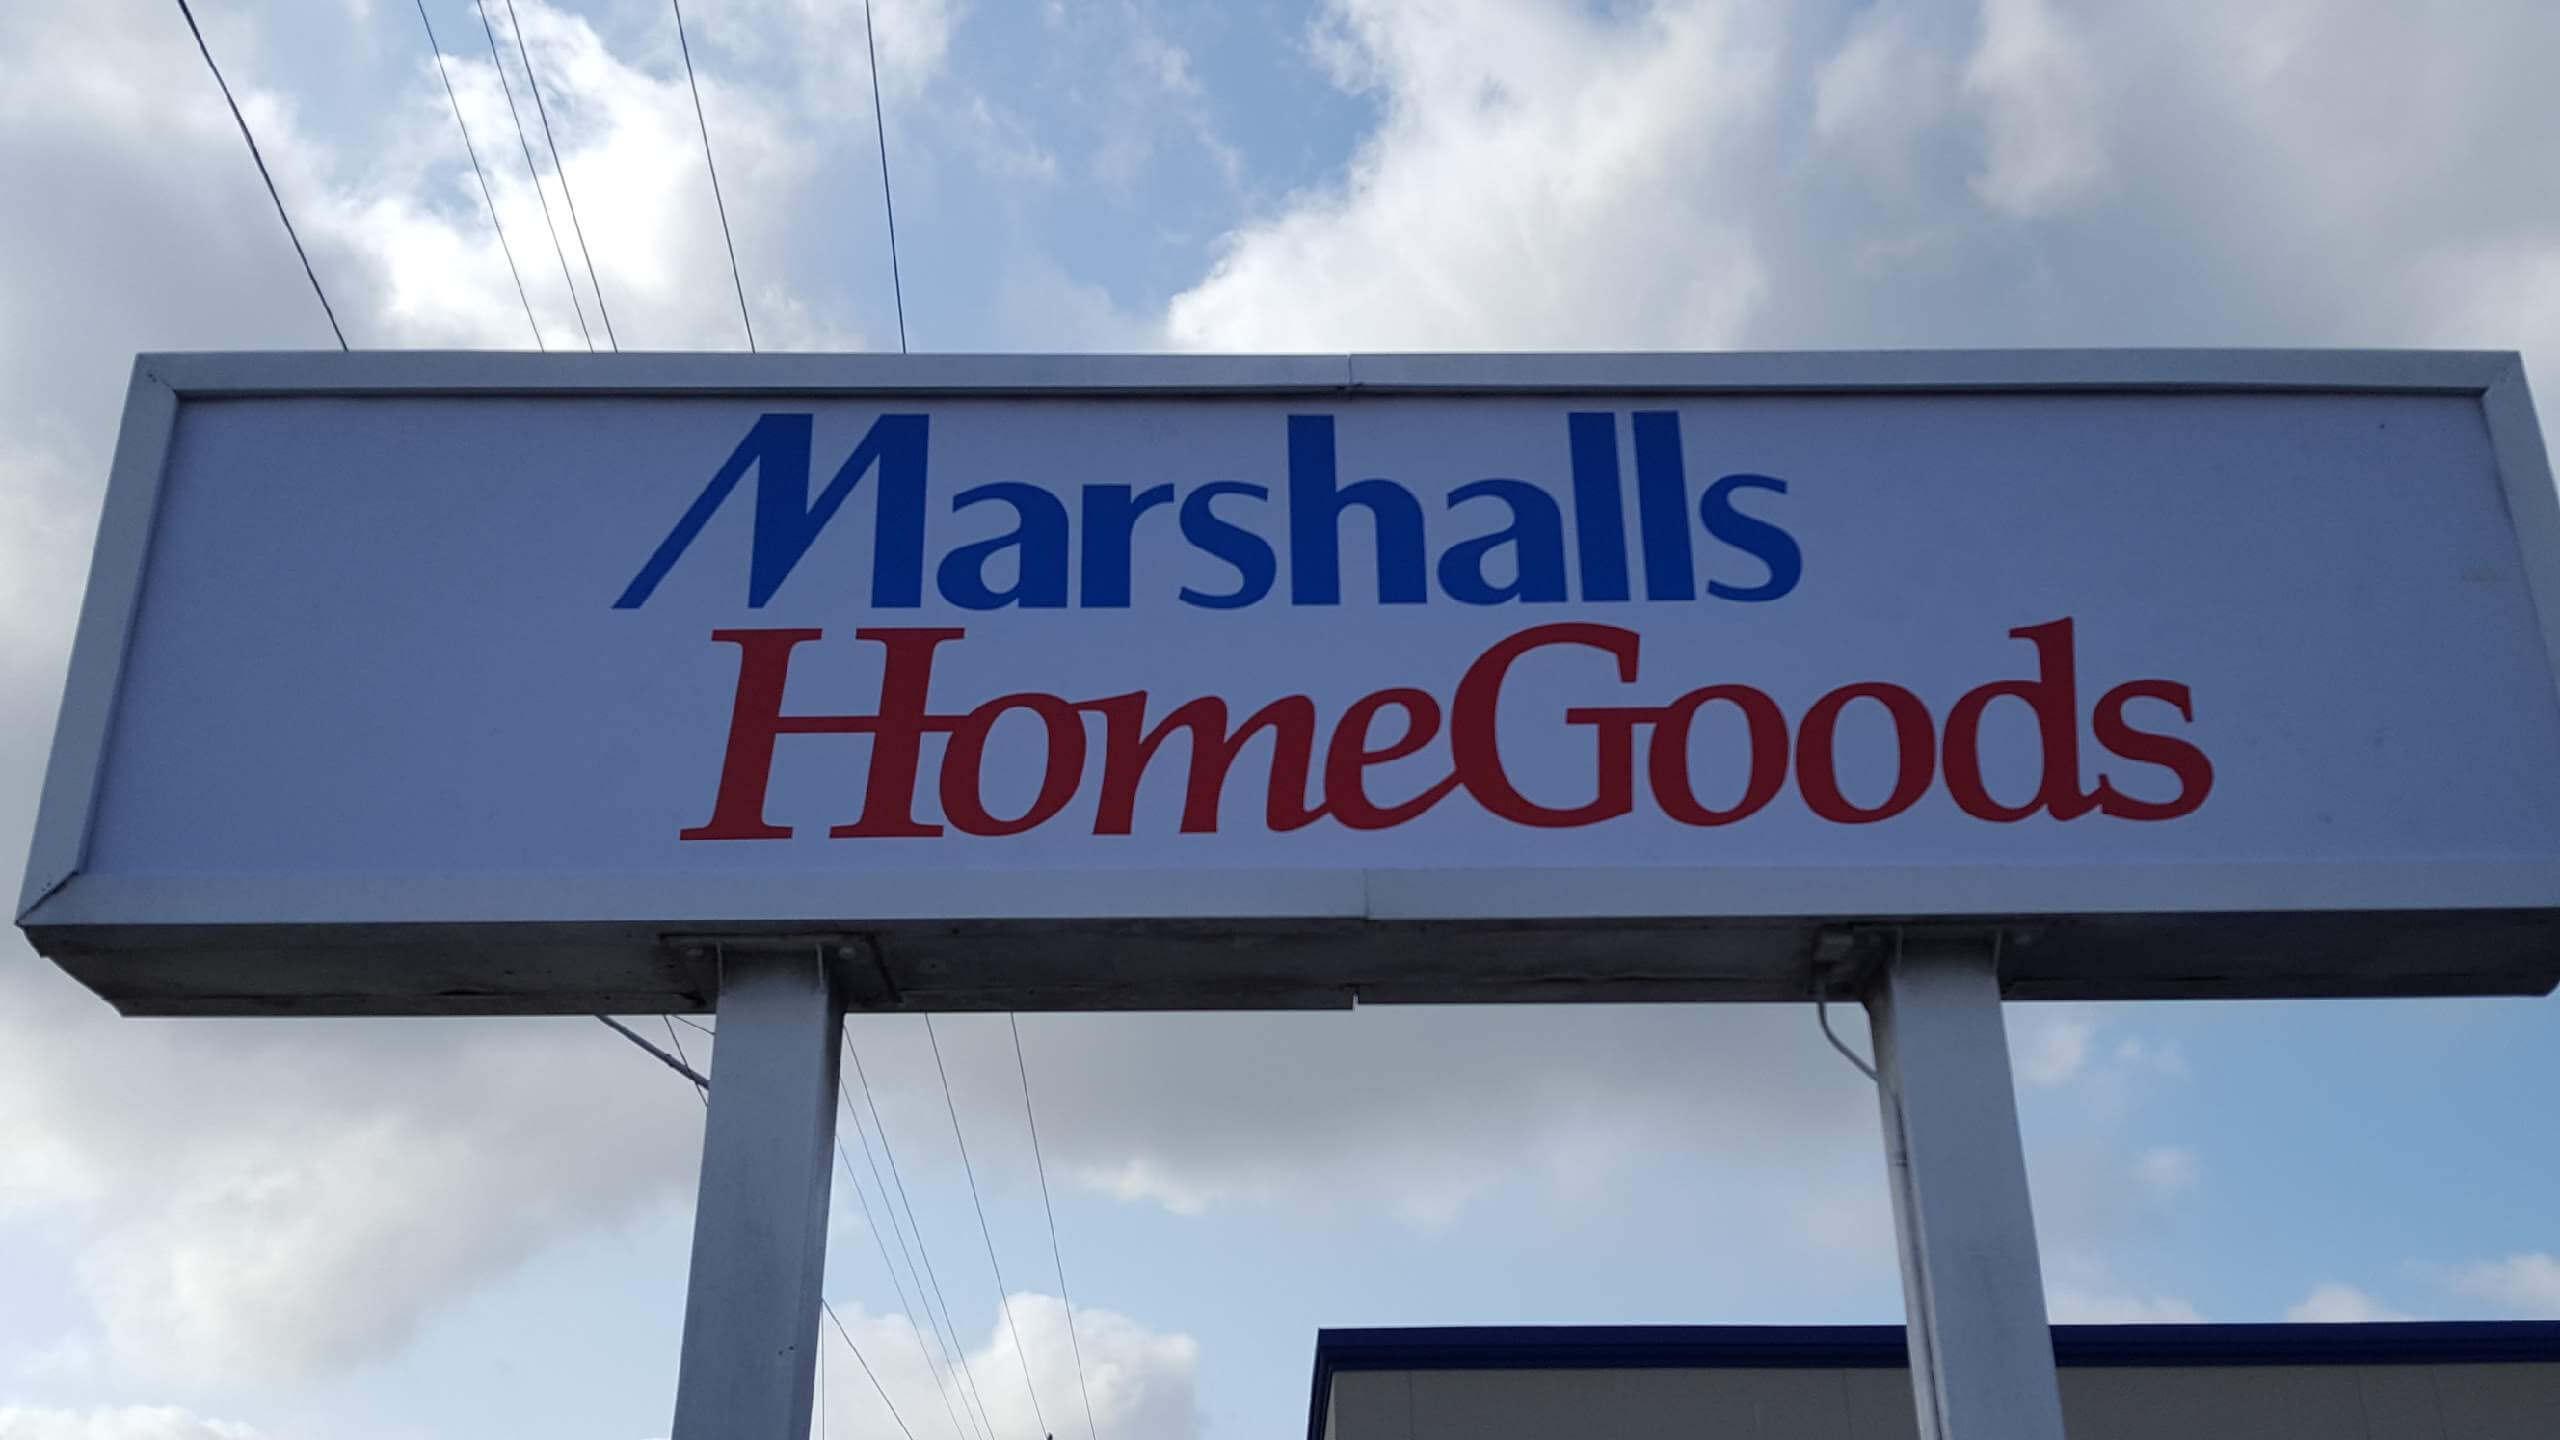 Marshalls HomeGoods